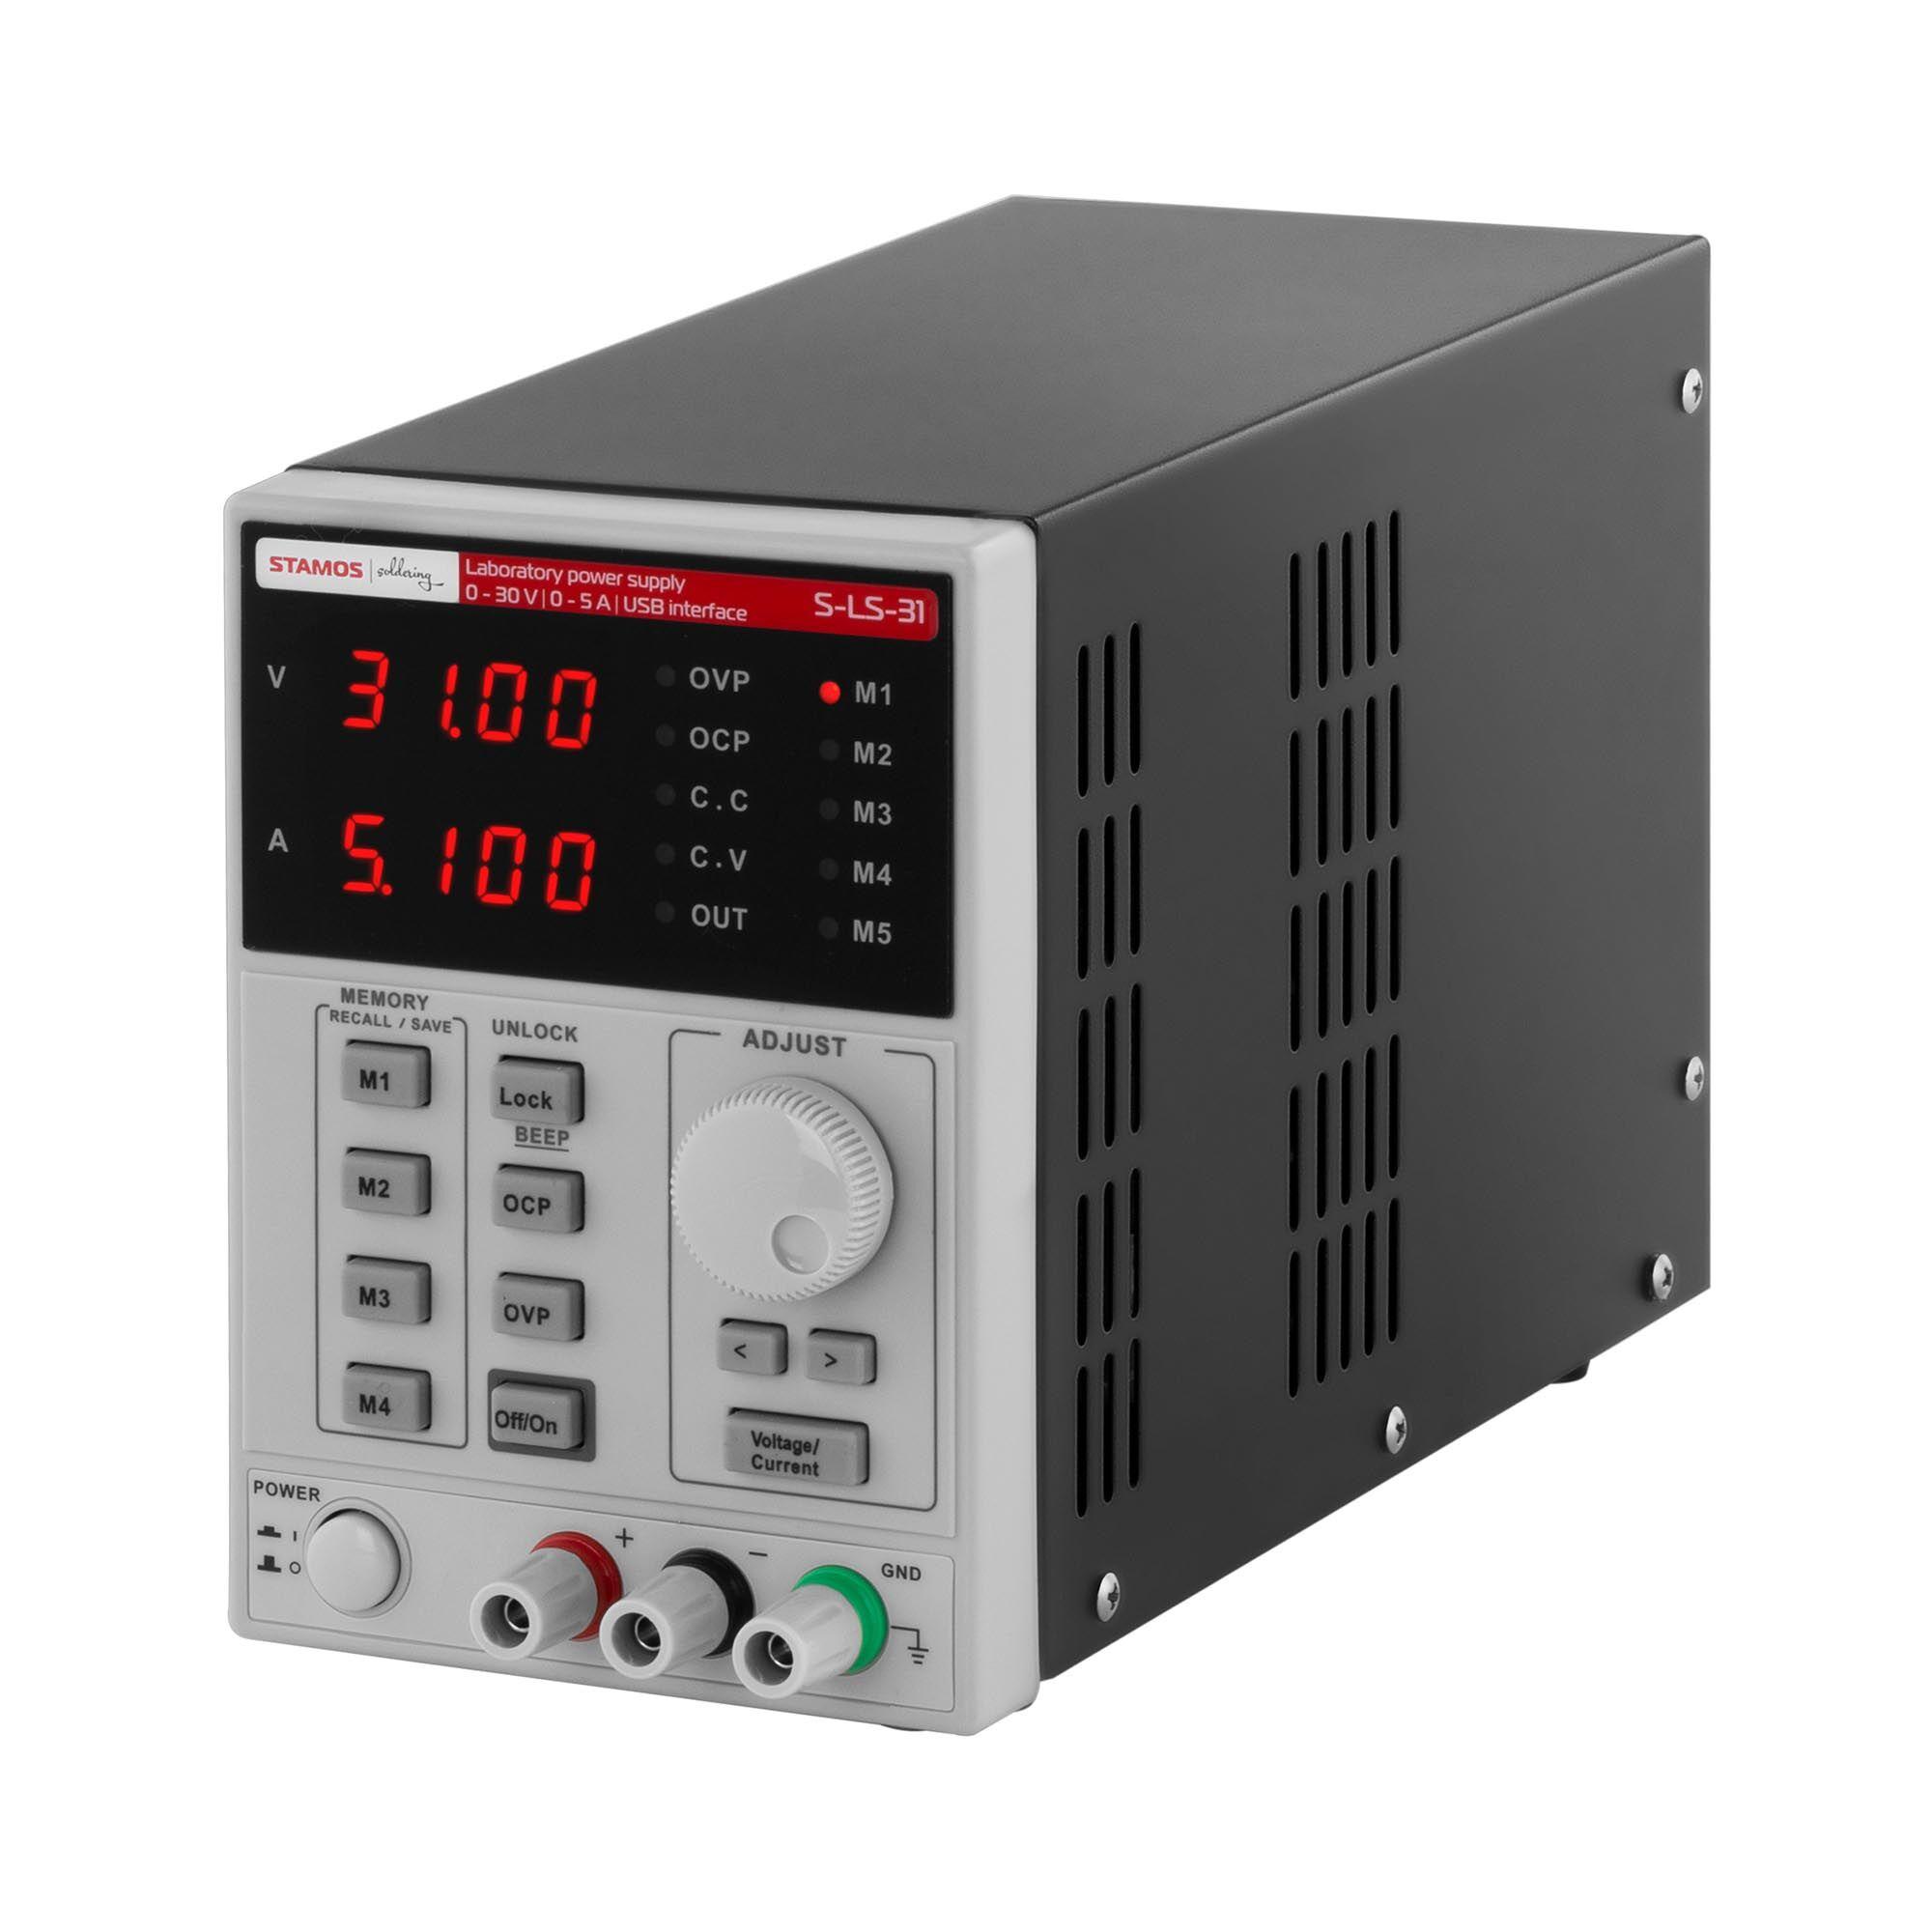 stamos soldering alimentatore da banco - 0-30 v, 0-5 a cc, 250 w - usb - 4 memorie s-ls-31